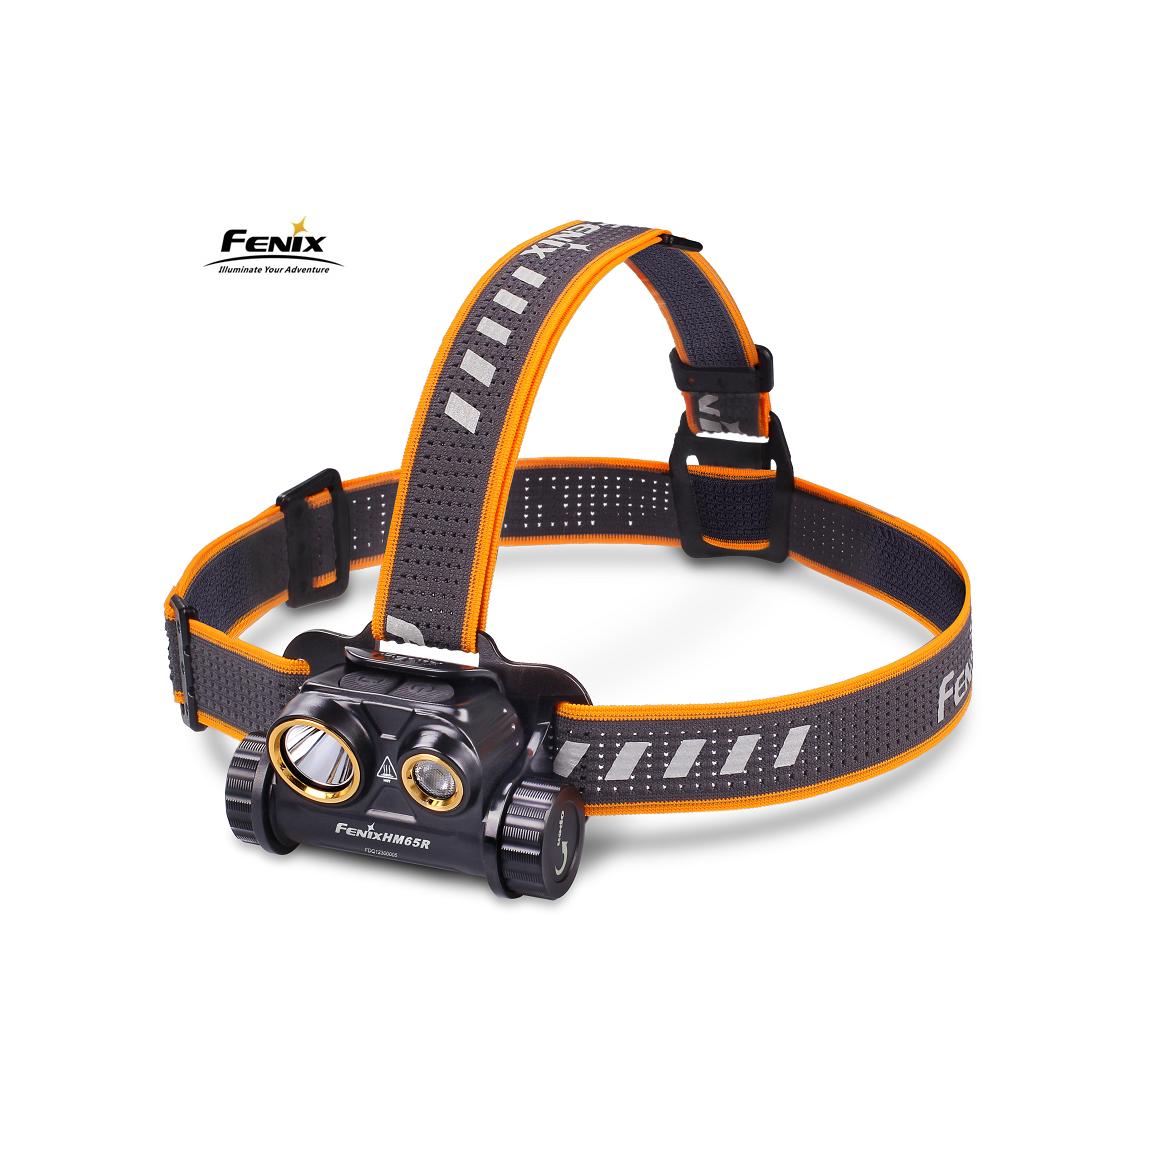 Fenix HM65R Stirnlampe 1000 Lumen aufladbar inkl. 3500mAh Akku u. USB-Ladekabel